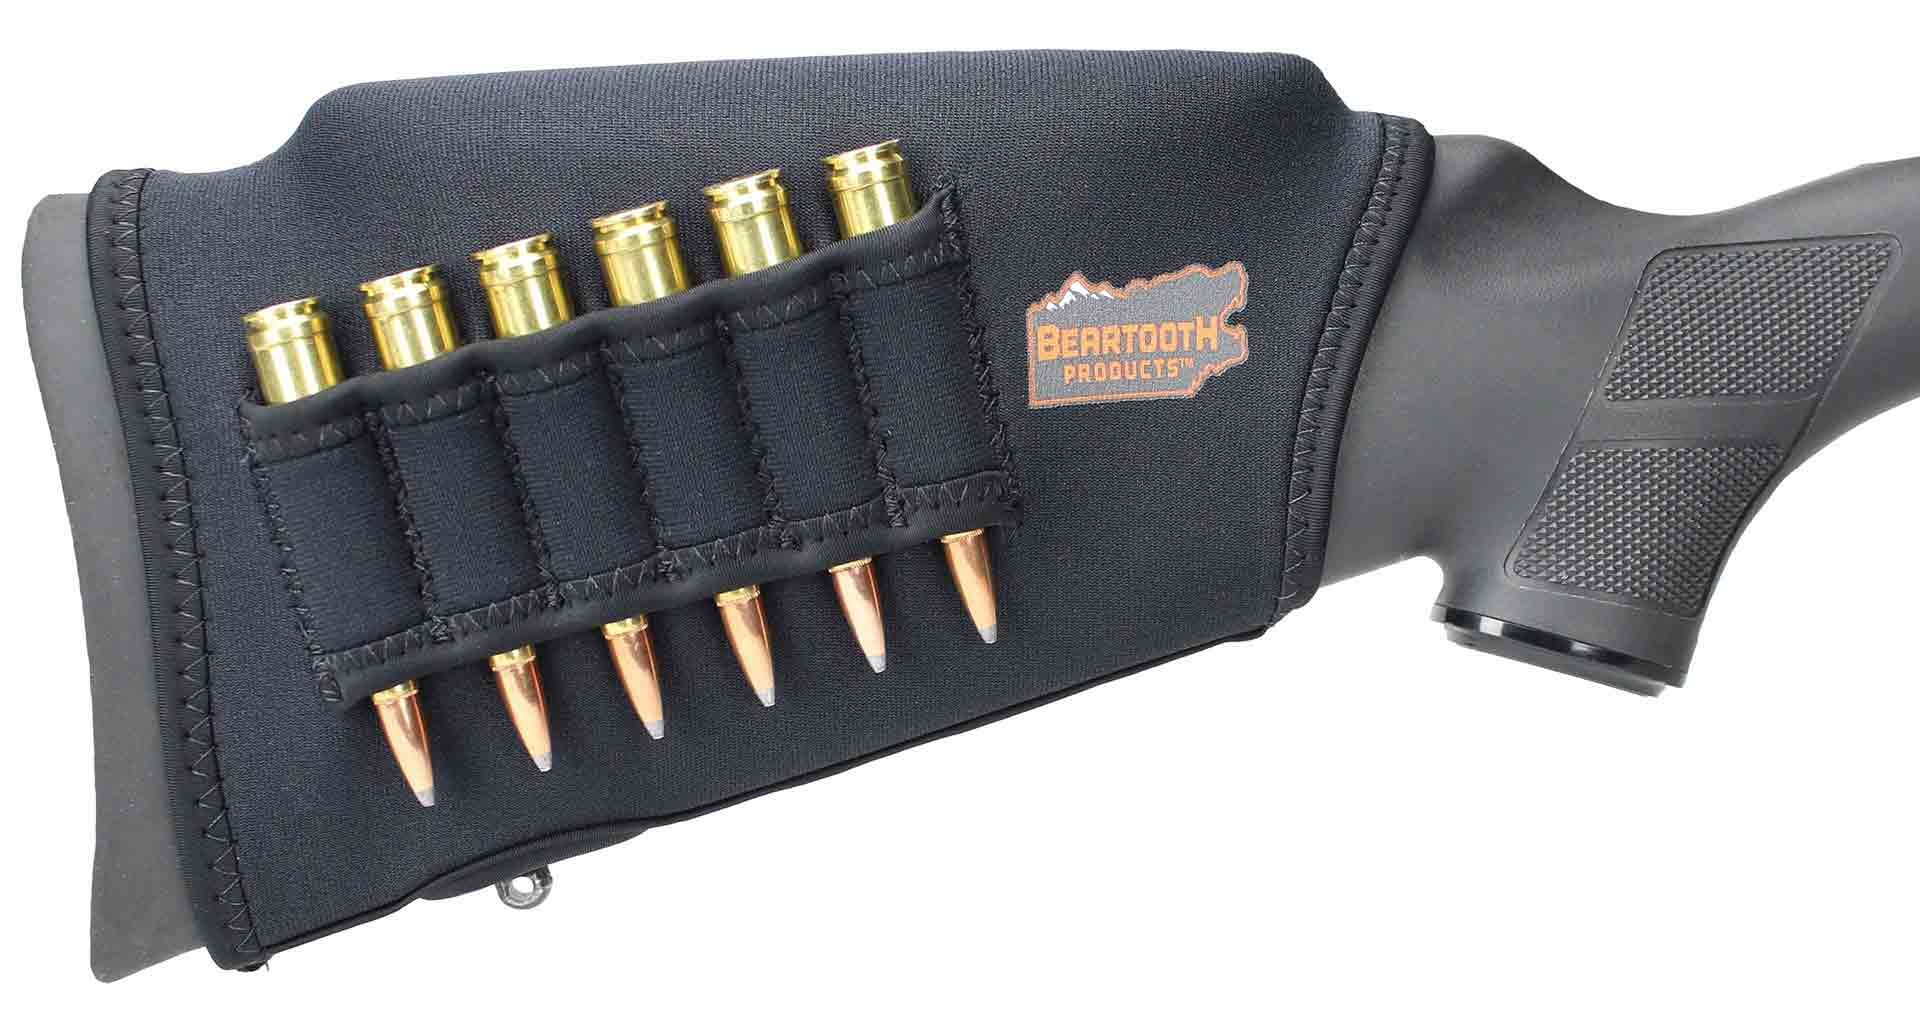 Beartooth Comb Raising Kit 2.0 - Premium Neoprene Gun Stock Cover + (5) Hi-density Foam Inserts - RIFLE MODEL (Black - Left Handed) by Beartooth